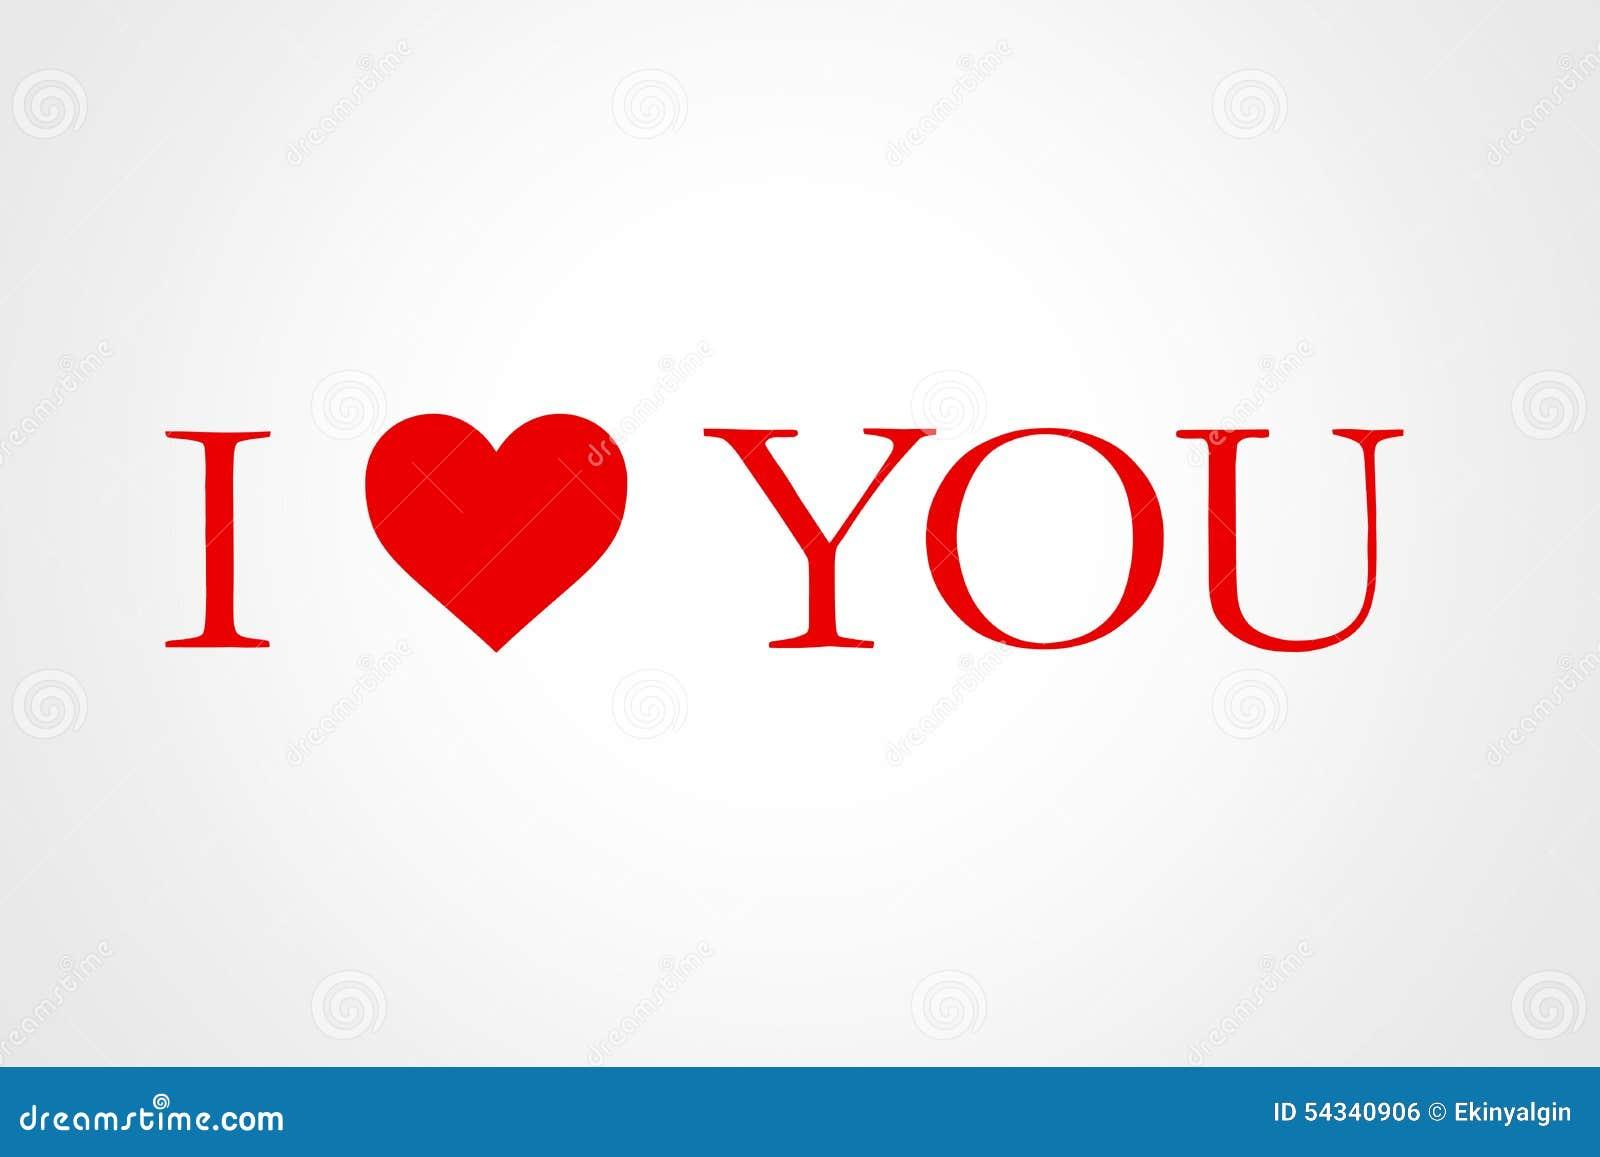 I love you symbol stock illustration illustration of design i love you symbol biocorpaavc Images